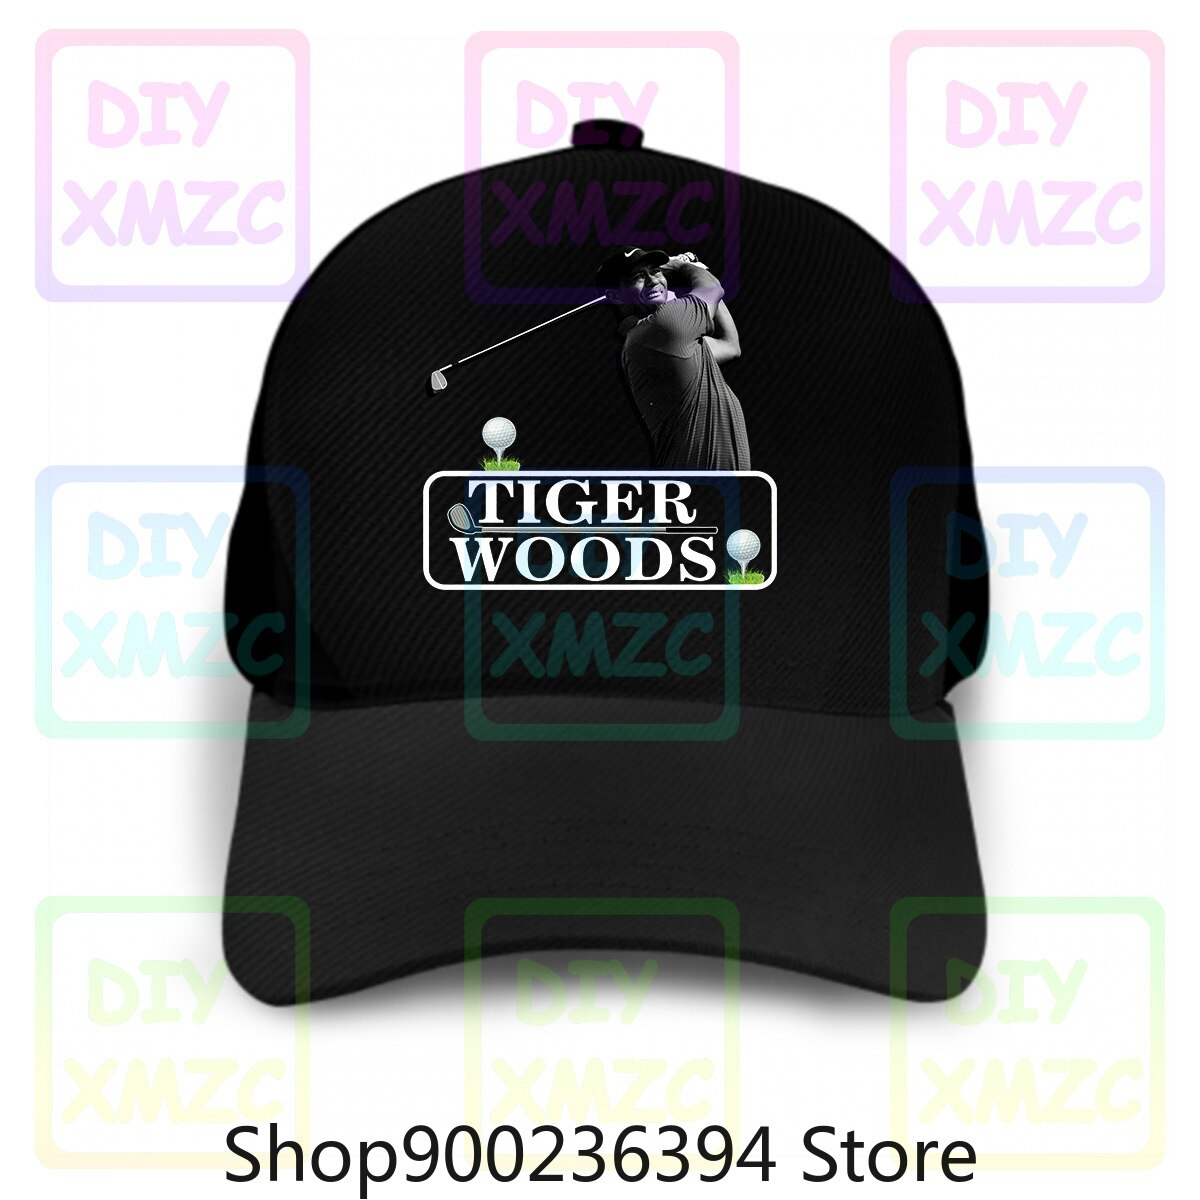 Los Tigres Woods 2019 gorra de béisbol nacional Golf Woods niños adultos sombreros superior